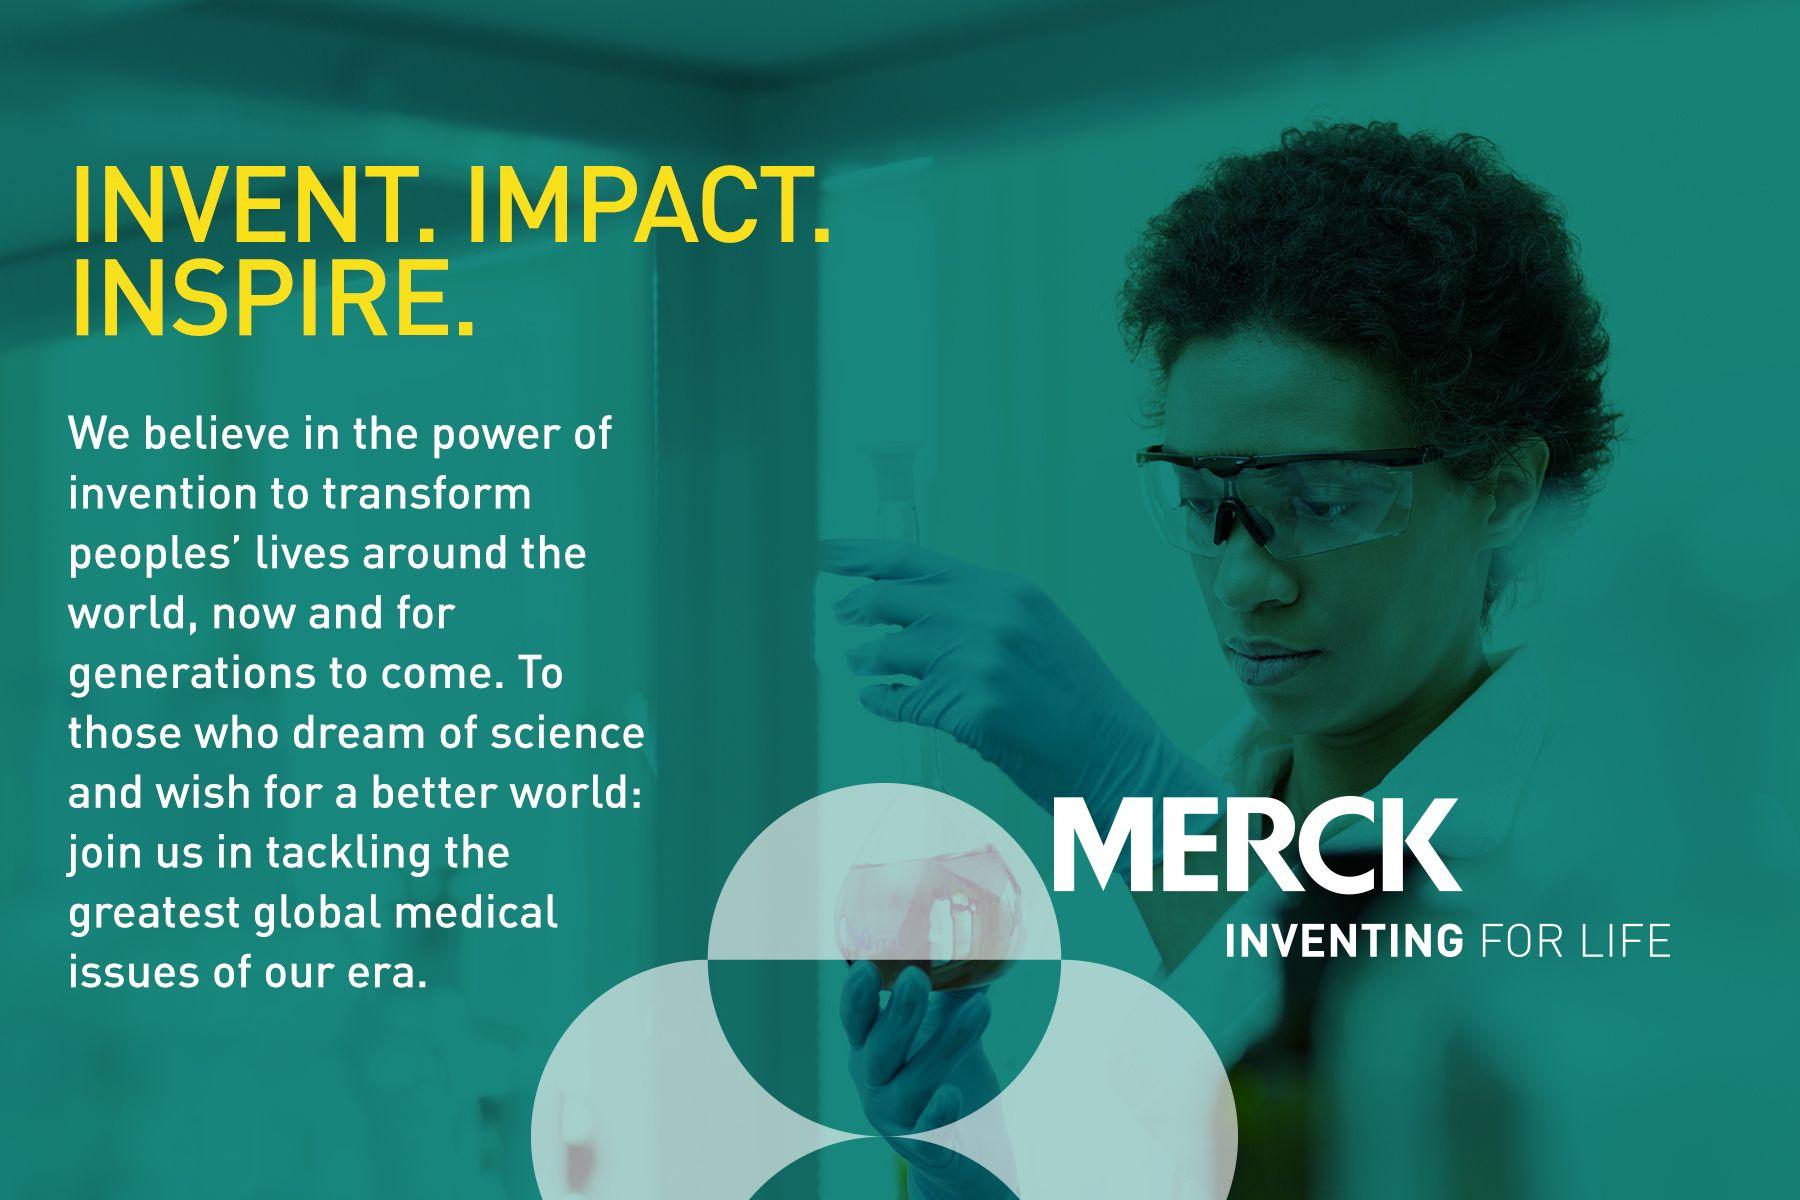 Oncology Careers With Merck Merck Oncology Jobs Careers Lifescience Medicine Merckcareers Life Science Merck Career Growth